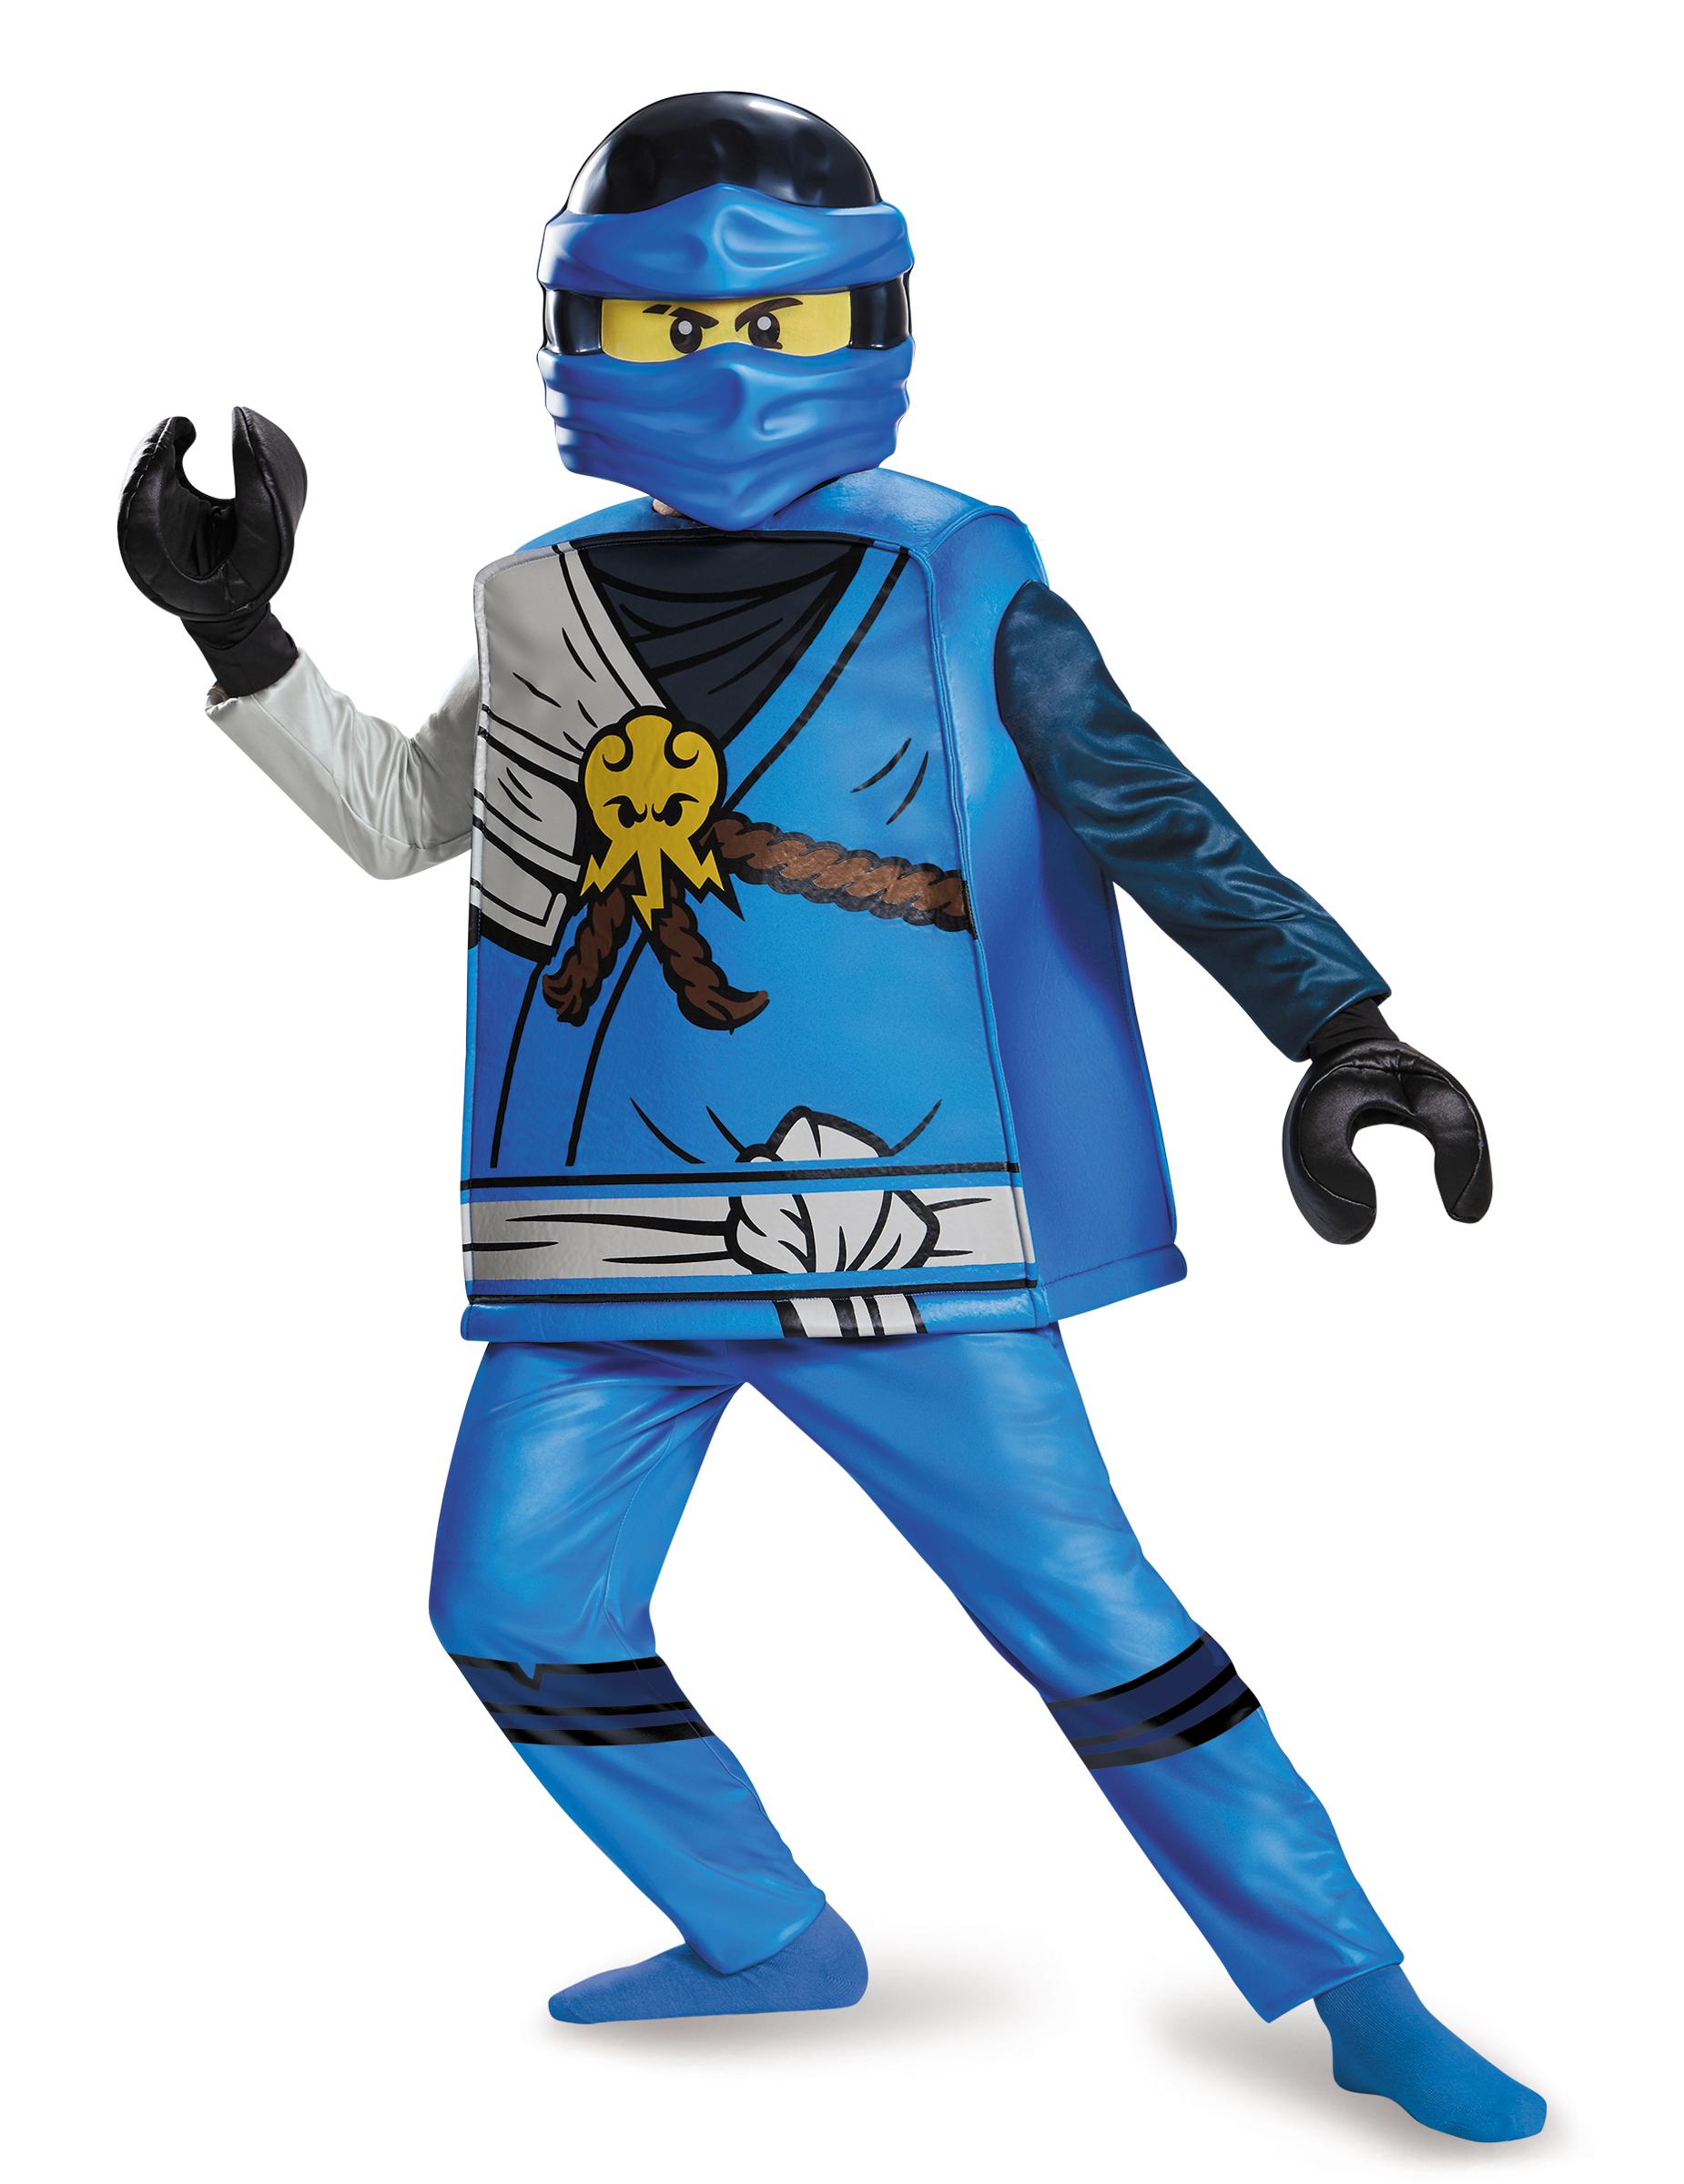 D guisement deluxe jay ninjago lego enfant deguise toi achat de d guisements enfants - Deguisement tete de lego ...